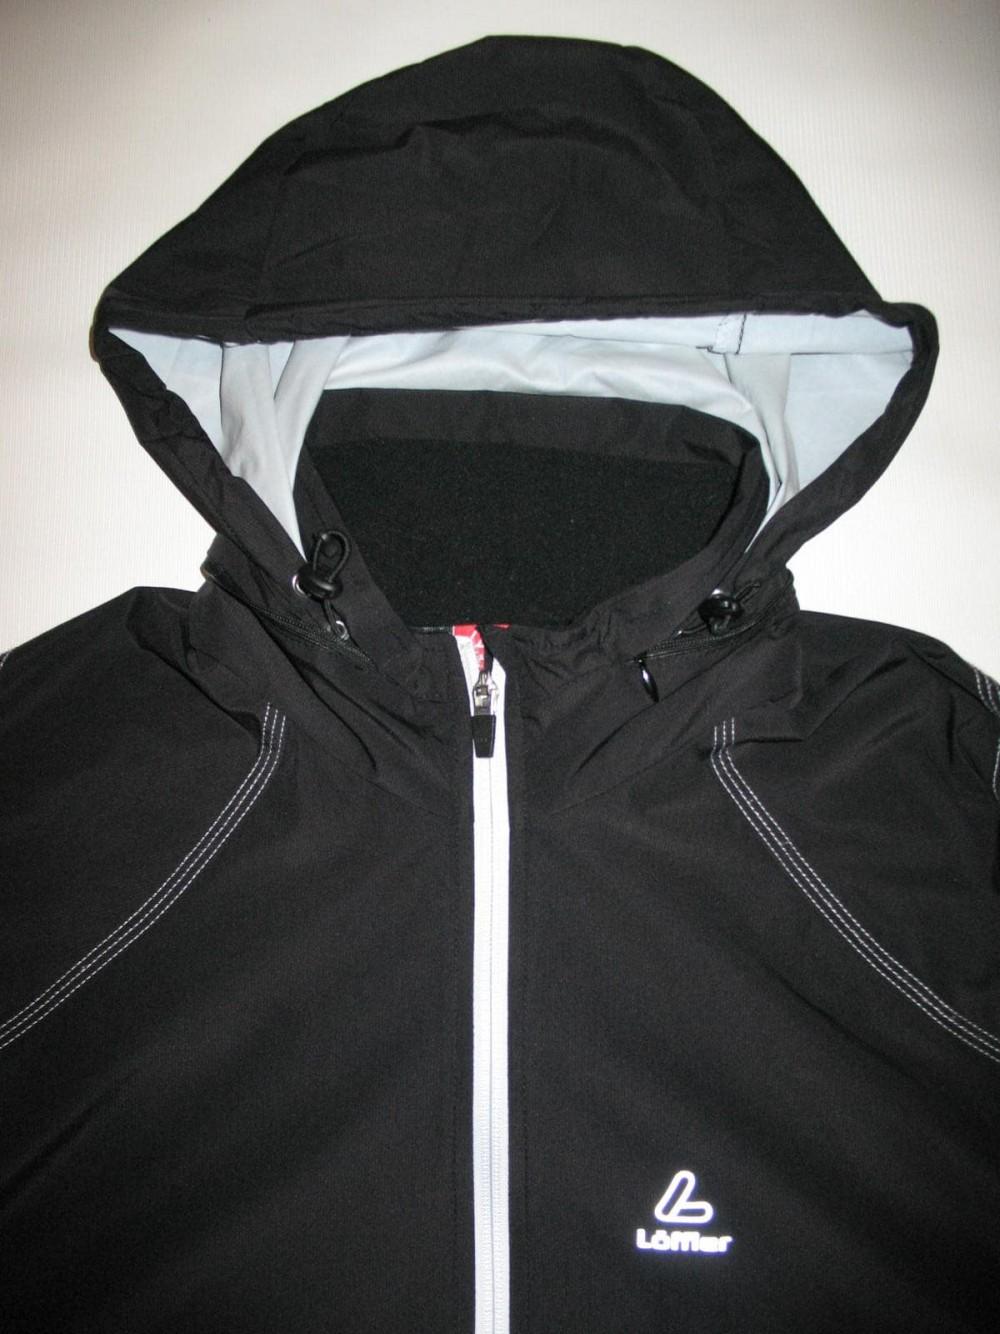 Куртка LOEFFLER windstopper jacket (размер 56/XXL), - 2